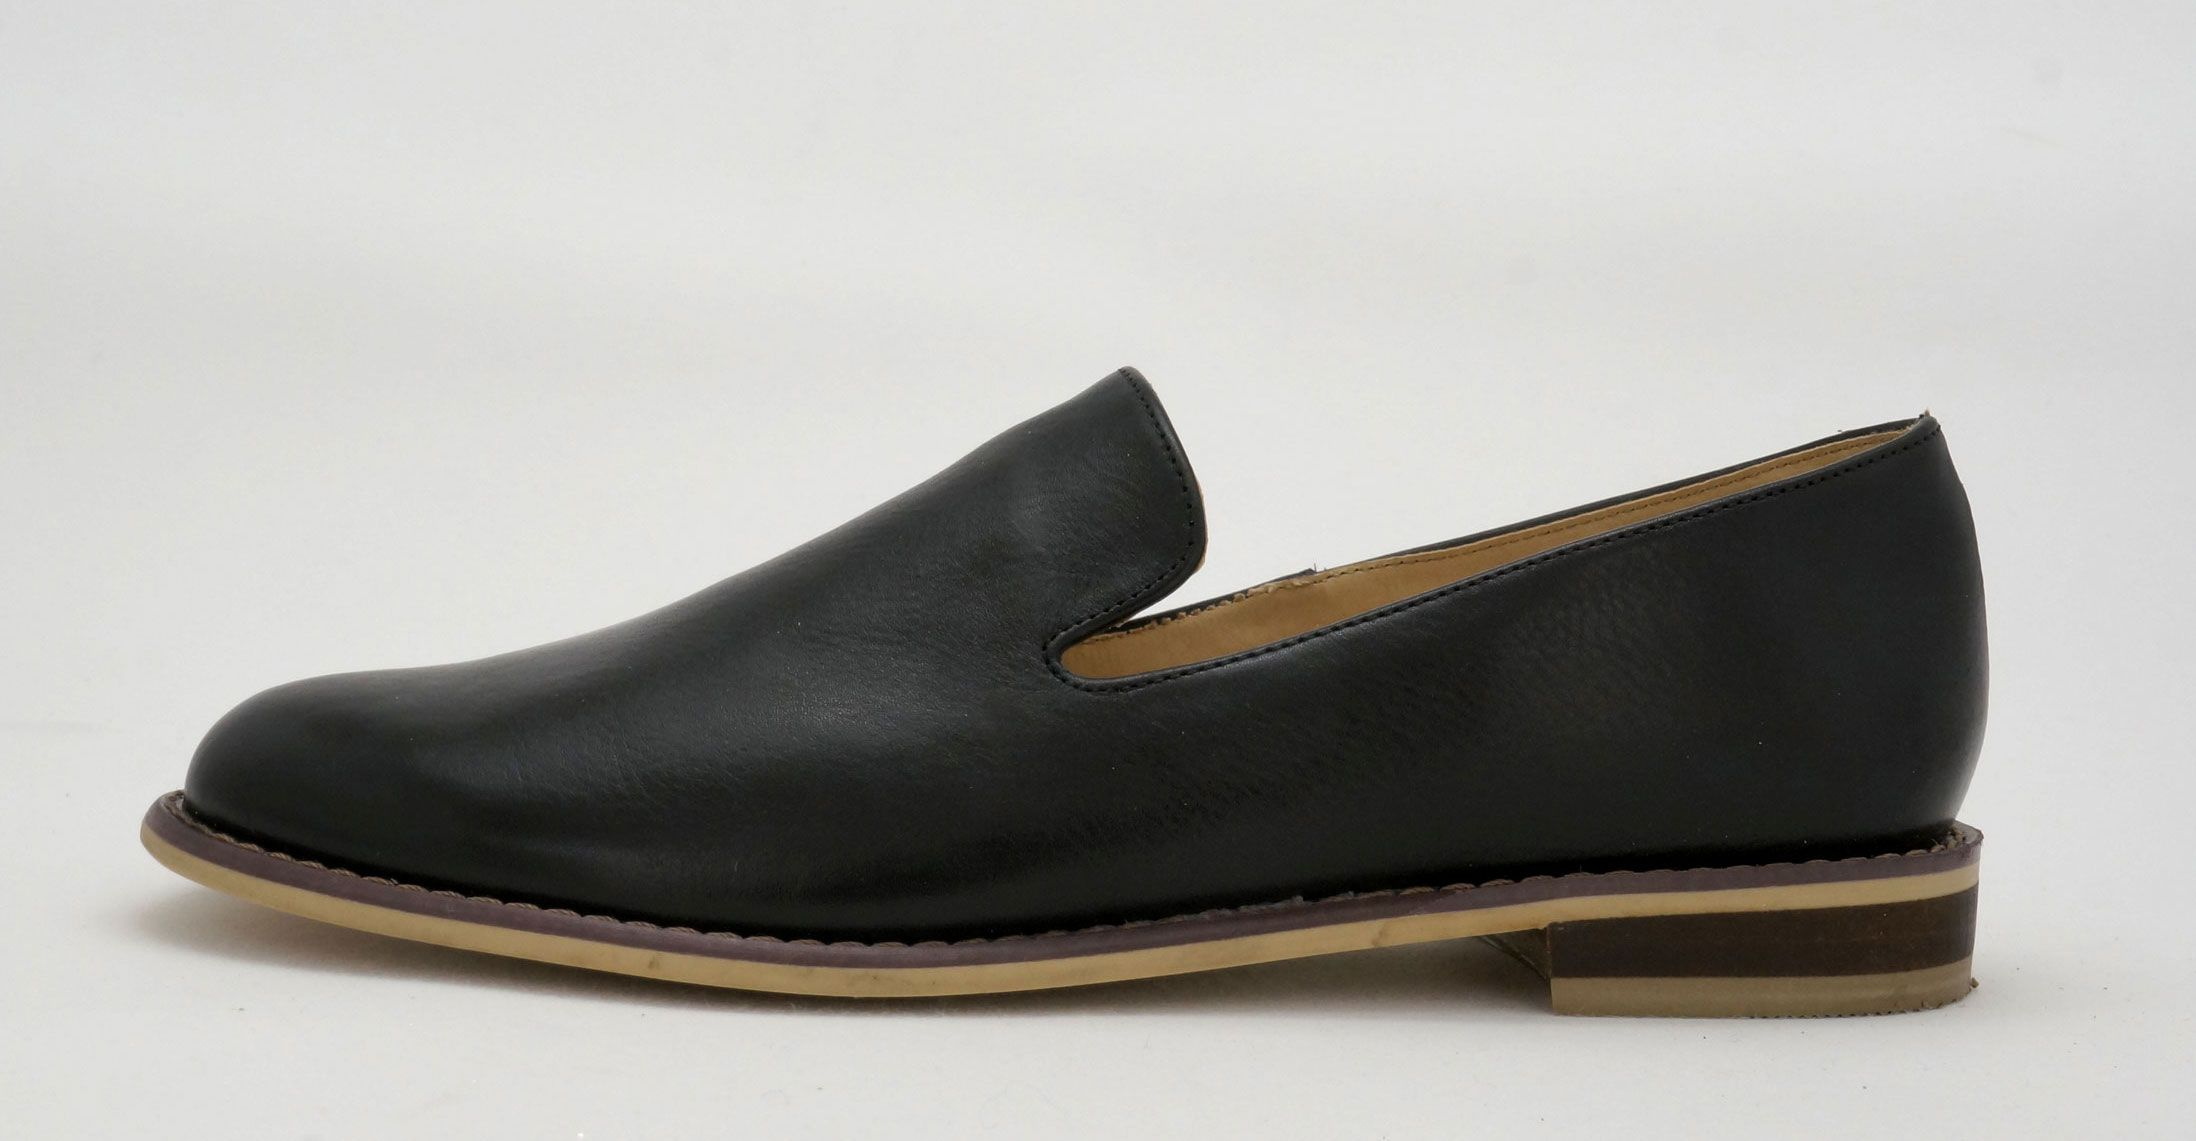 Aeroflex Black Slip On Genuine Leather Shoes Leather Shoes Woman Black Slip Ons Genuine Leather Shoes